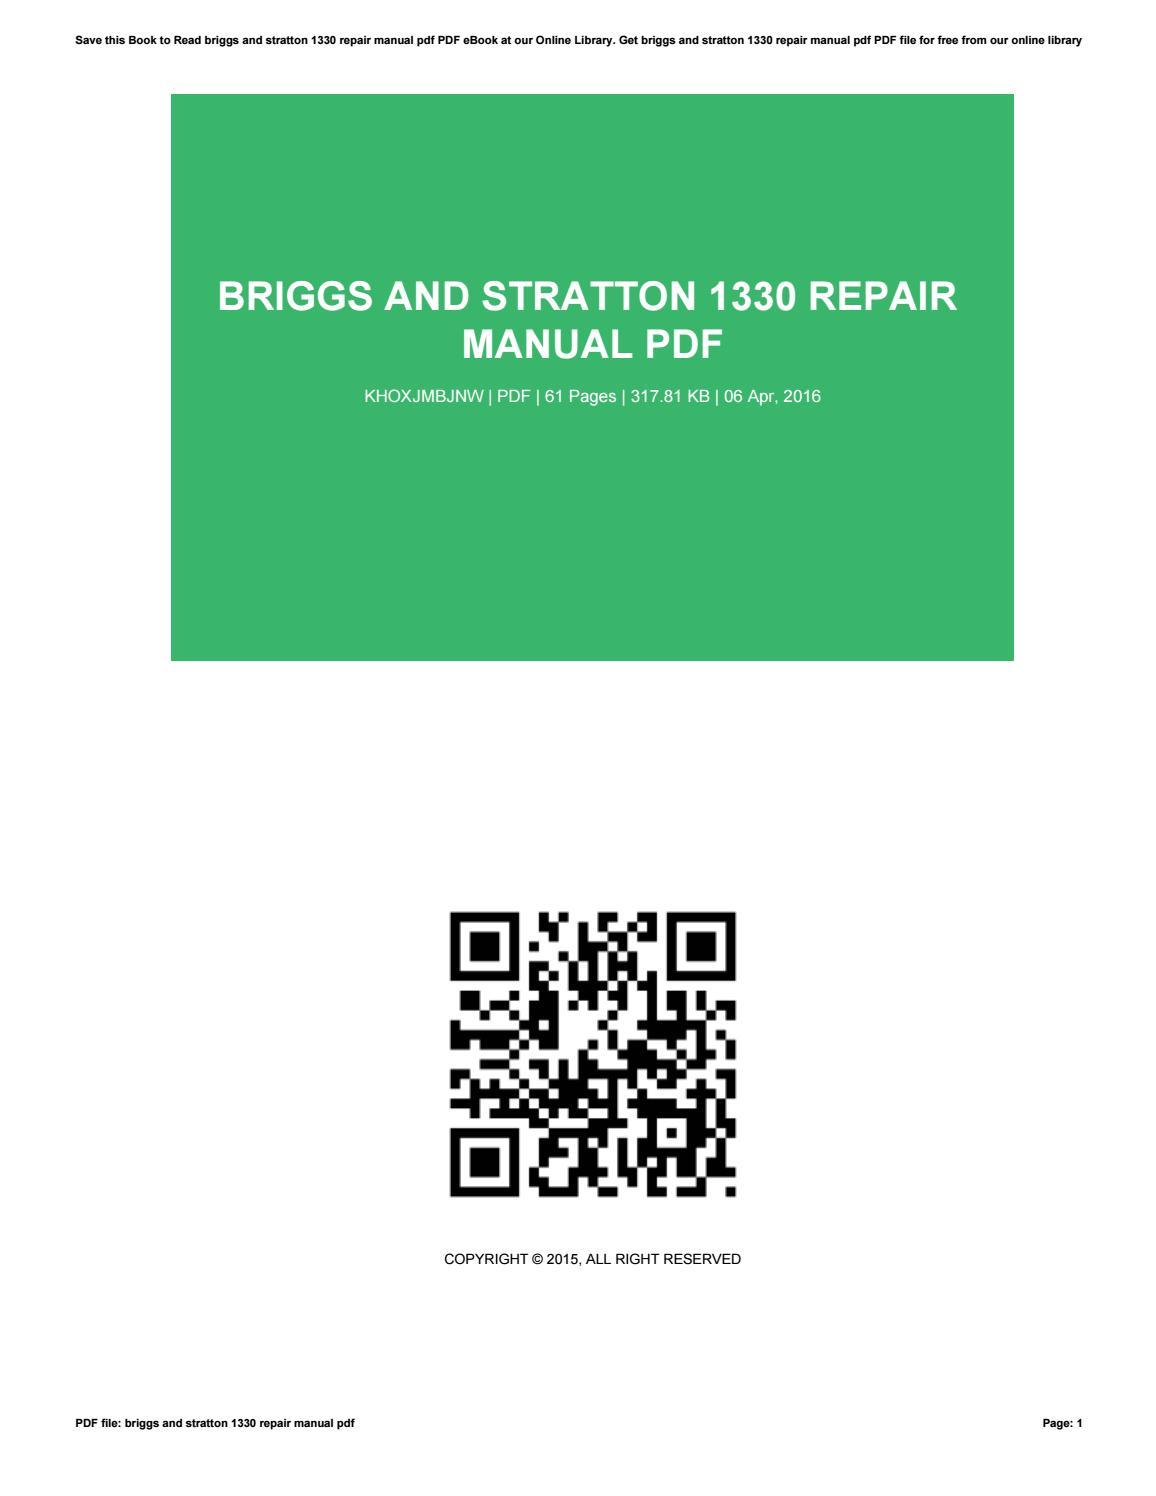 briggs and stratton 1330 repair manual pdf by candelaria issuu rh issuu com briggs and stratton repair manual 1330 pdf Briggs and Stratton Engine Identification